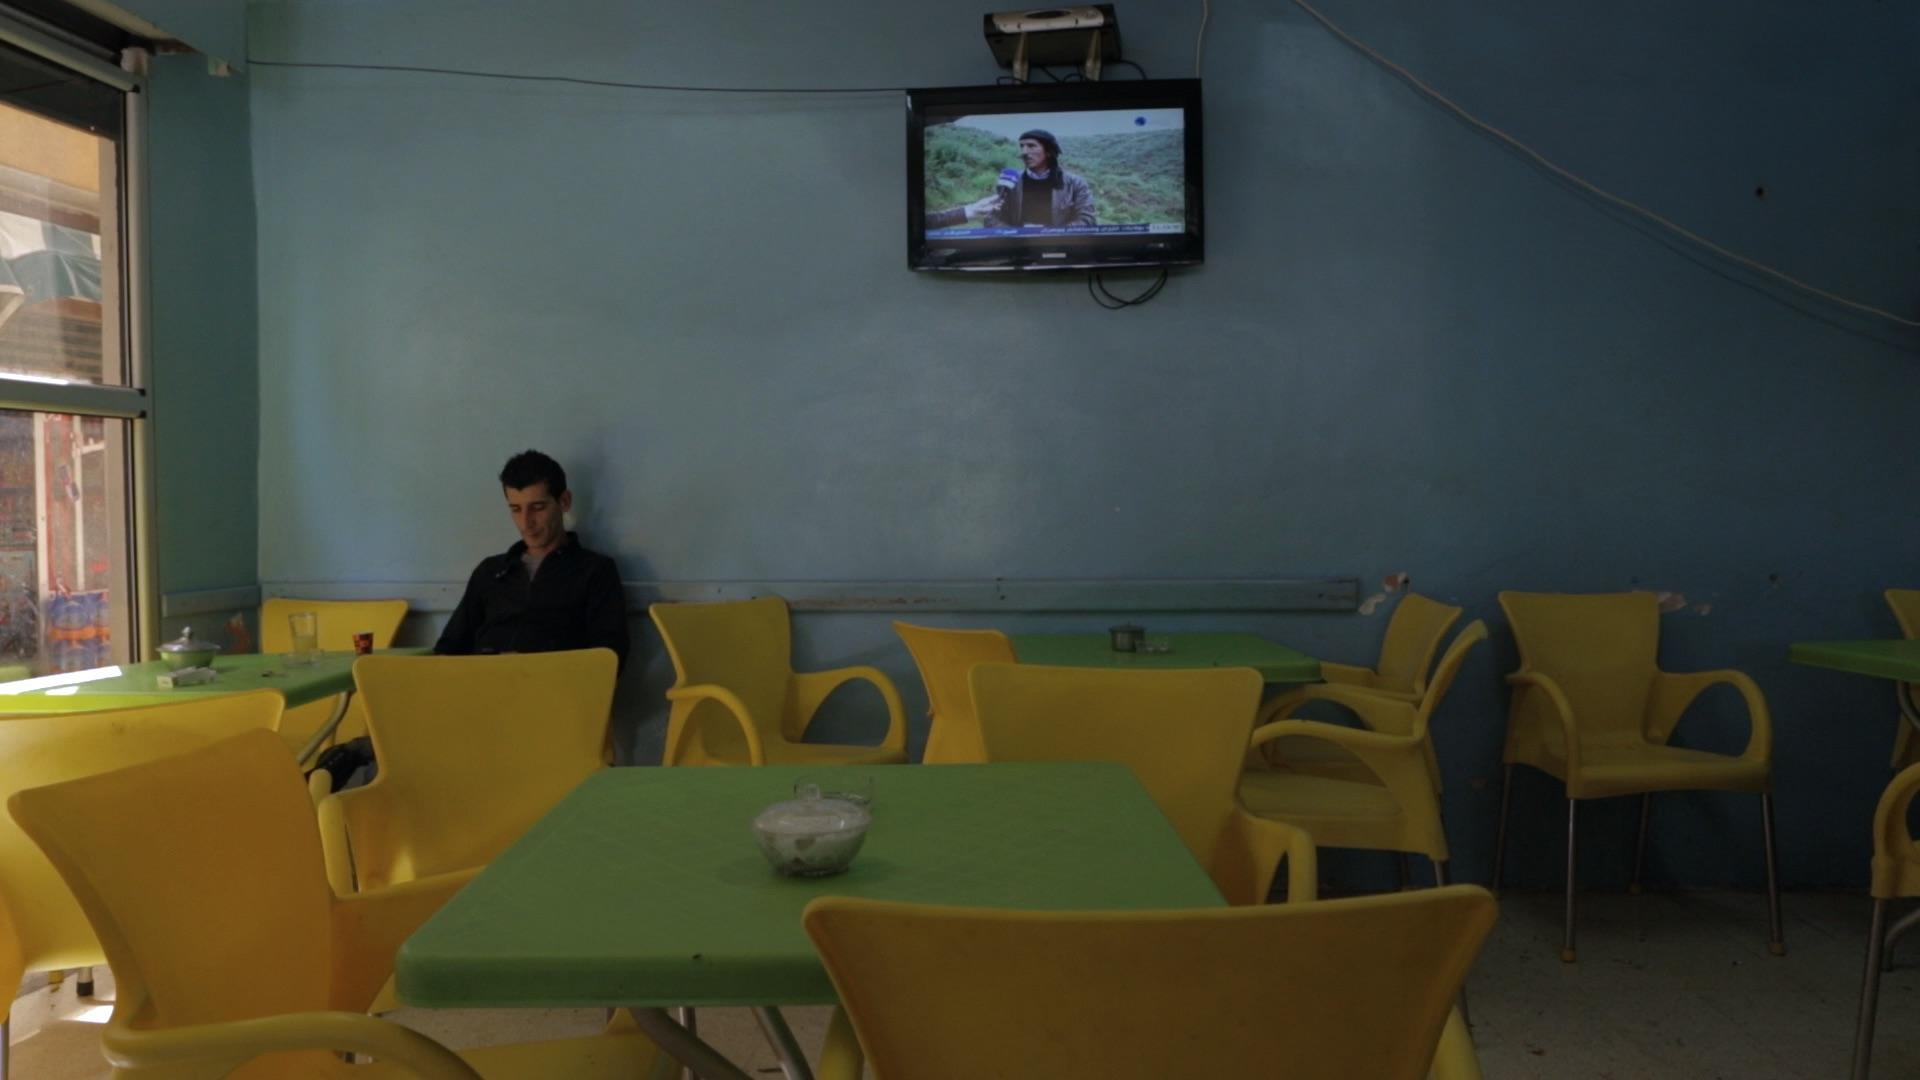 Vote Off - A film by Fayçal Hammoun